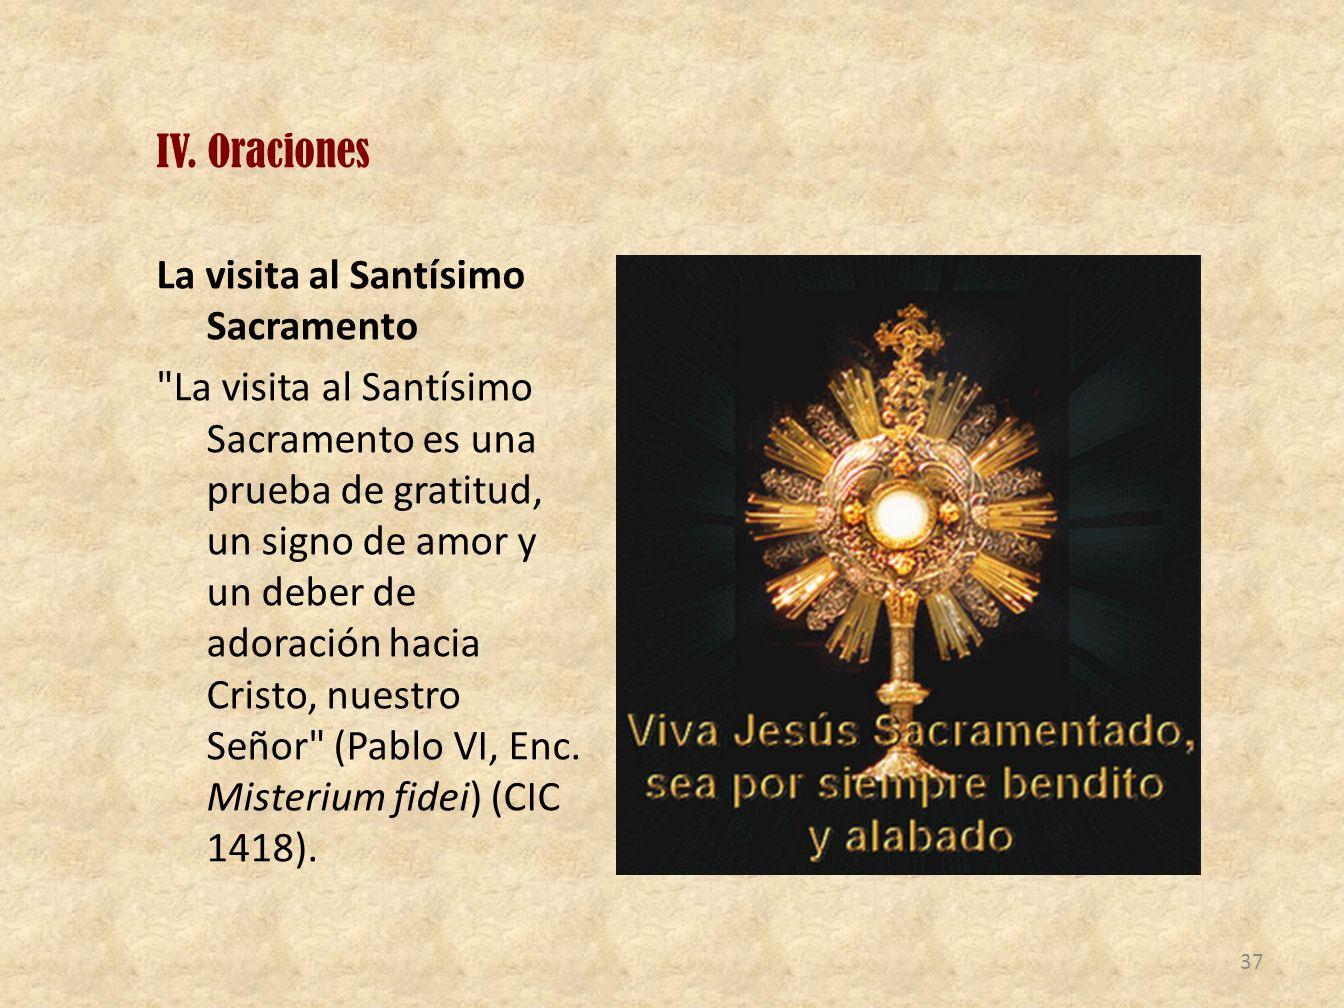 IV. Oraciones La visita al Santísimo Sacramento